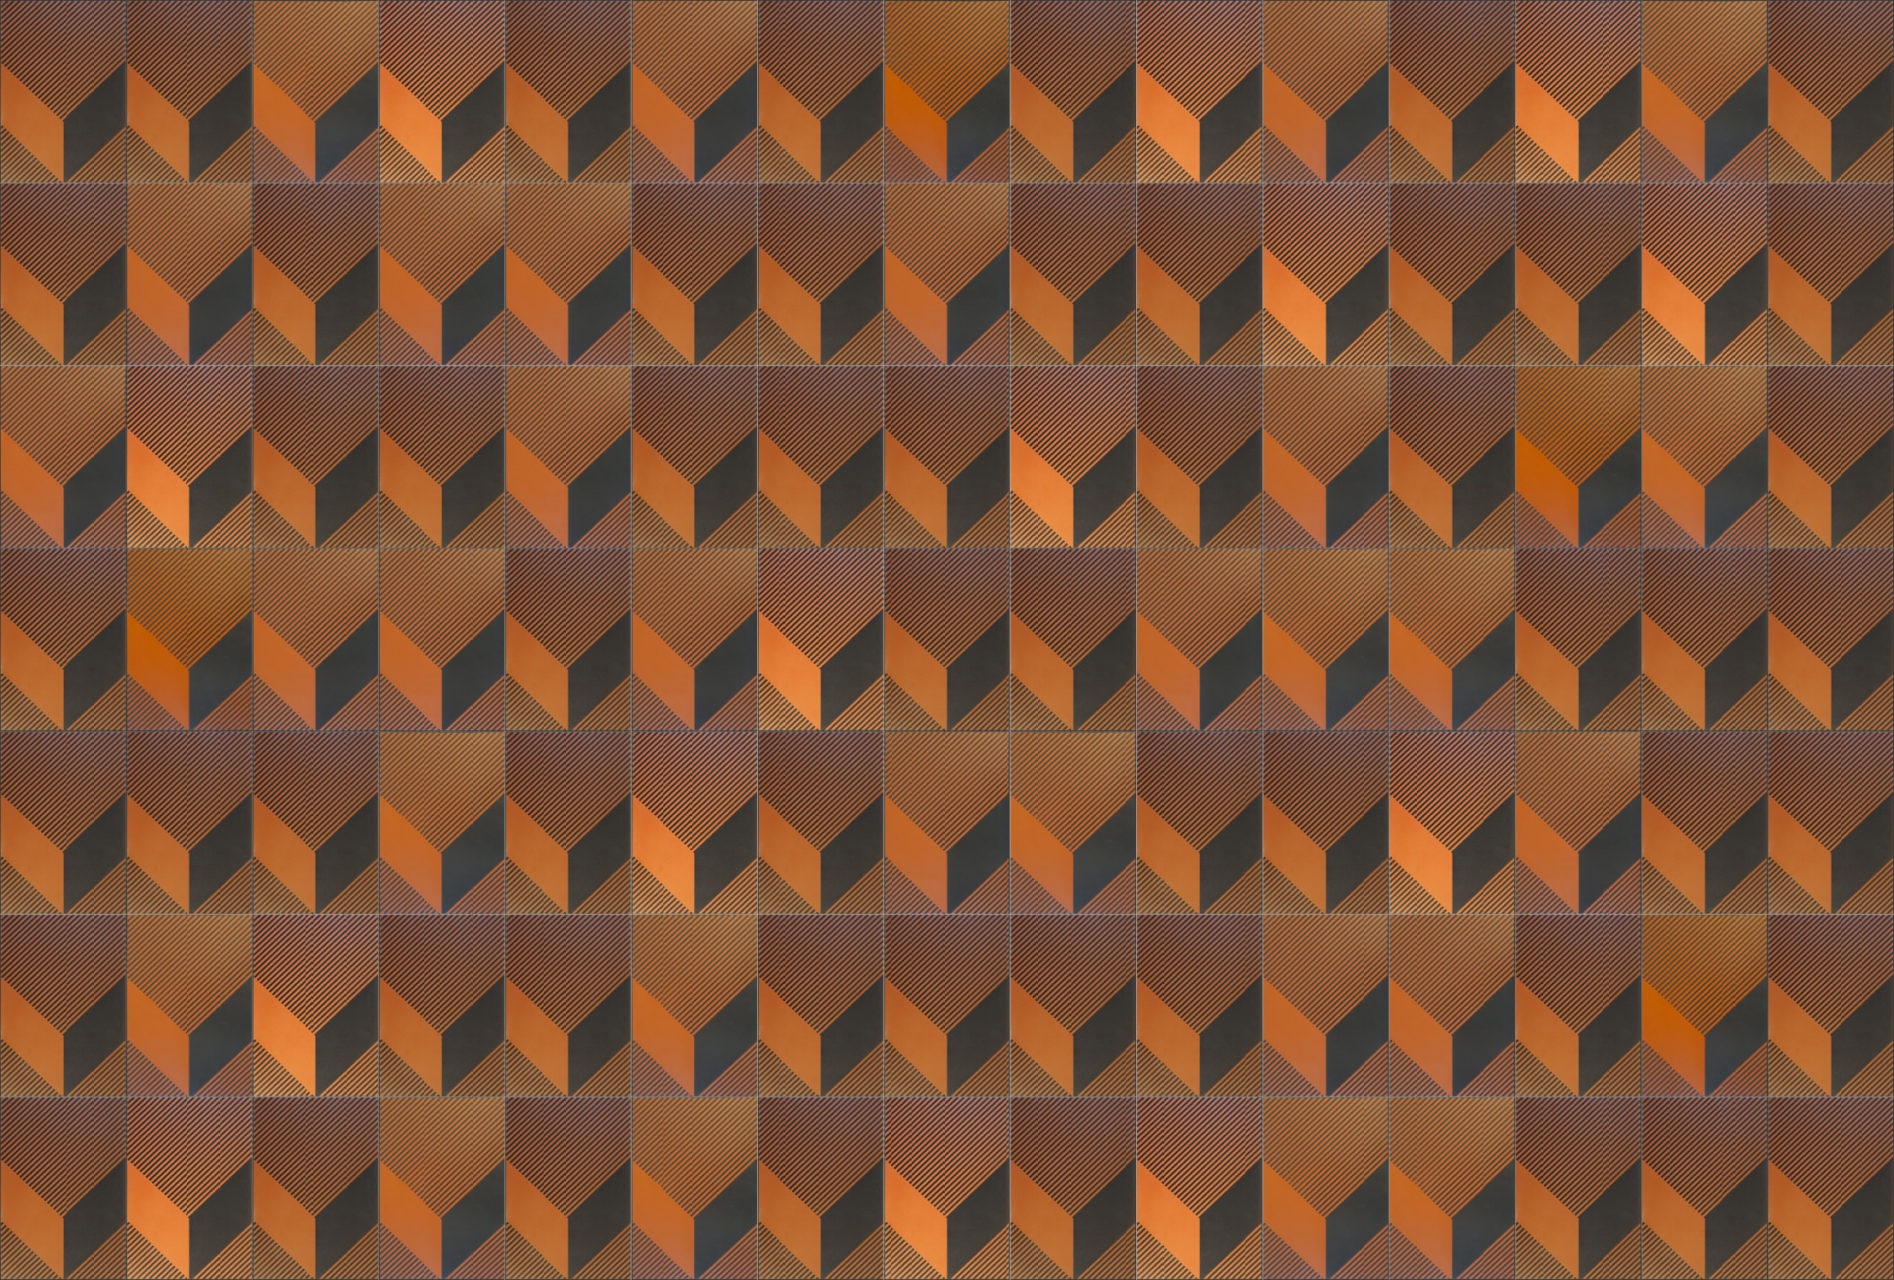 geometrico_rouge_mur01